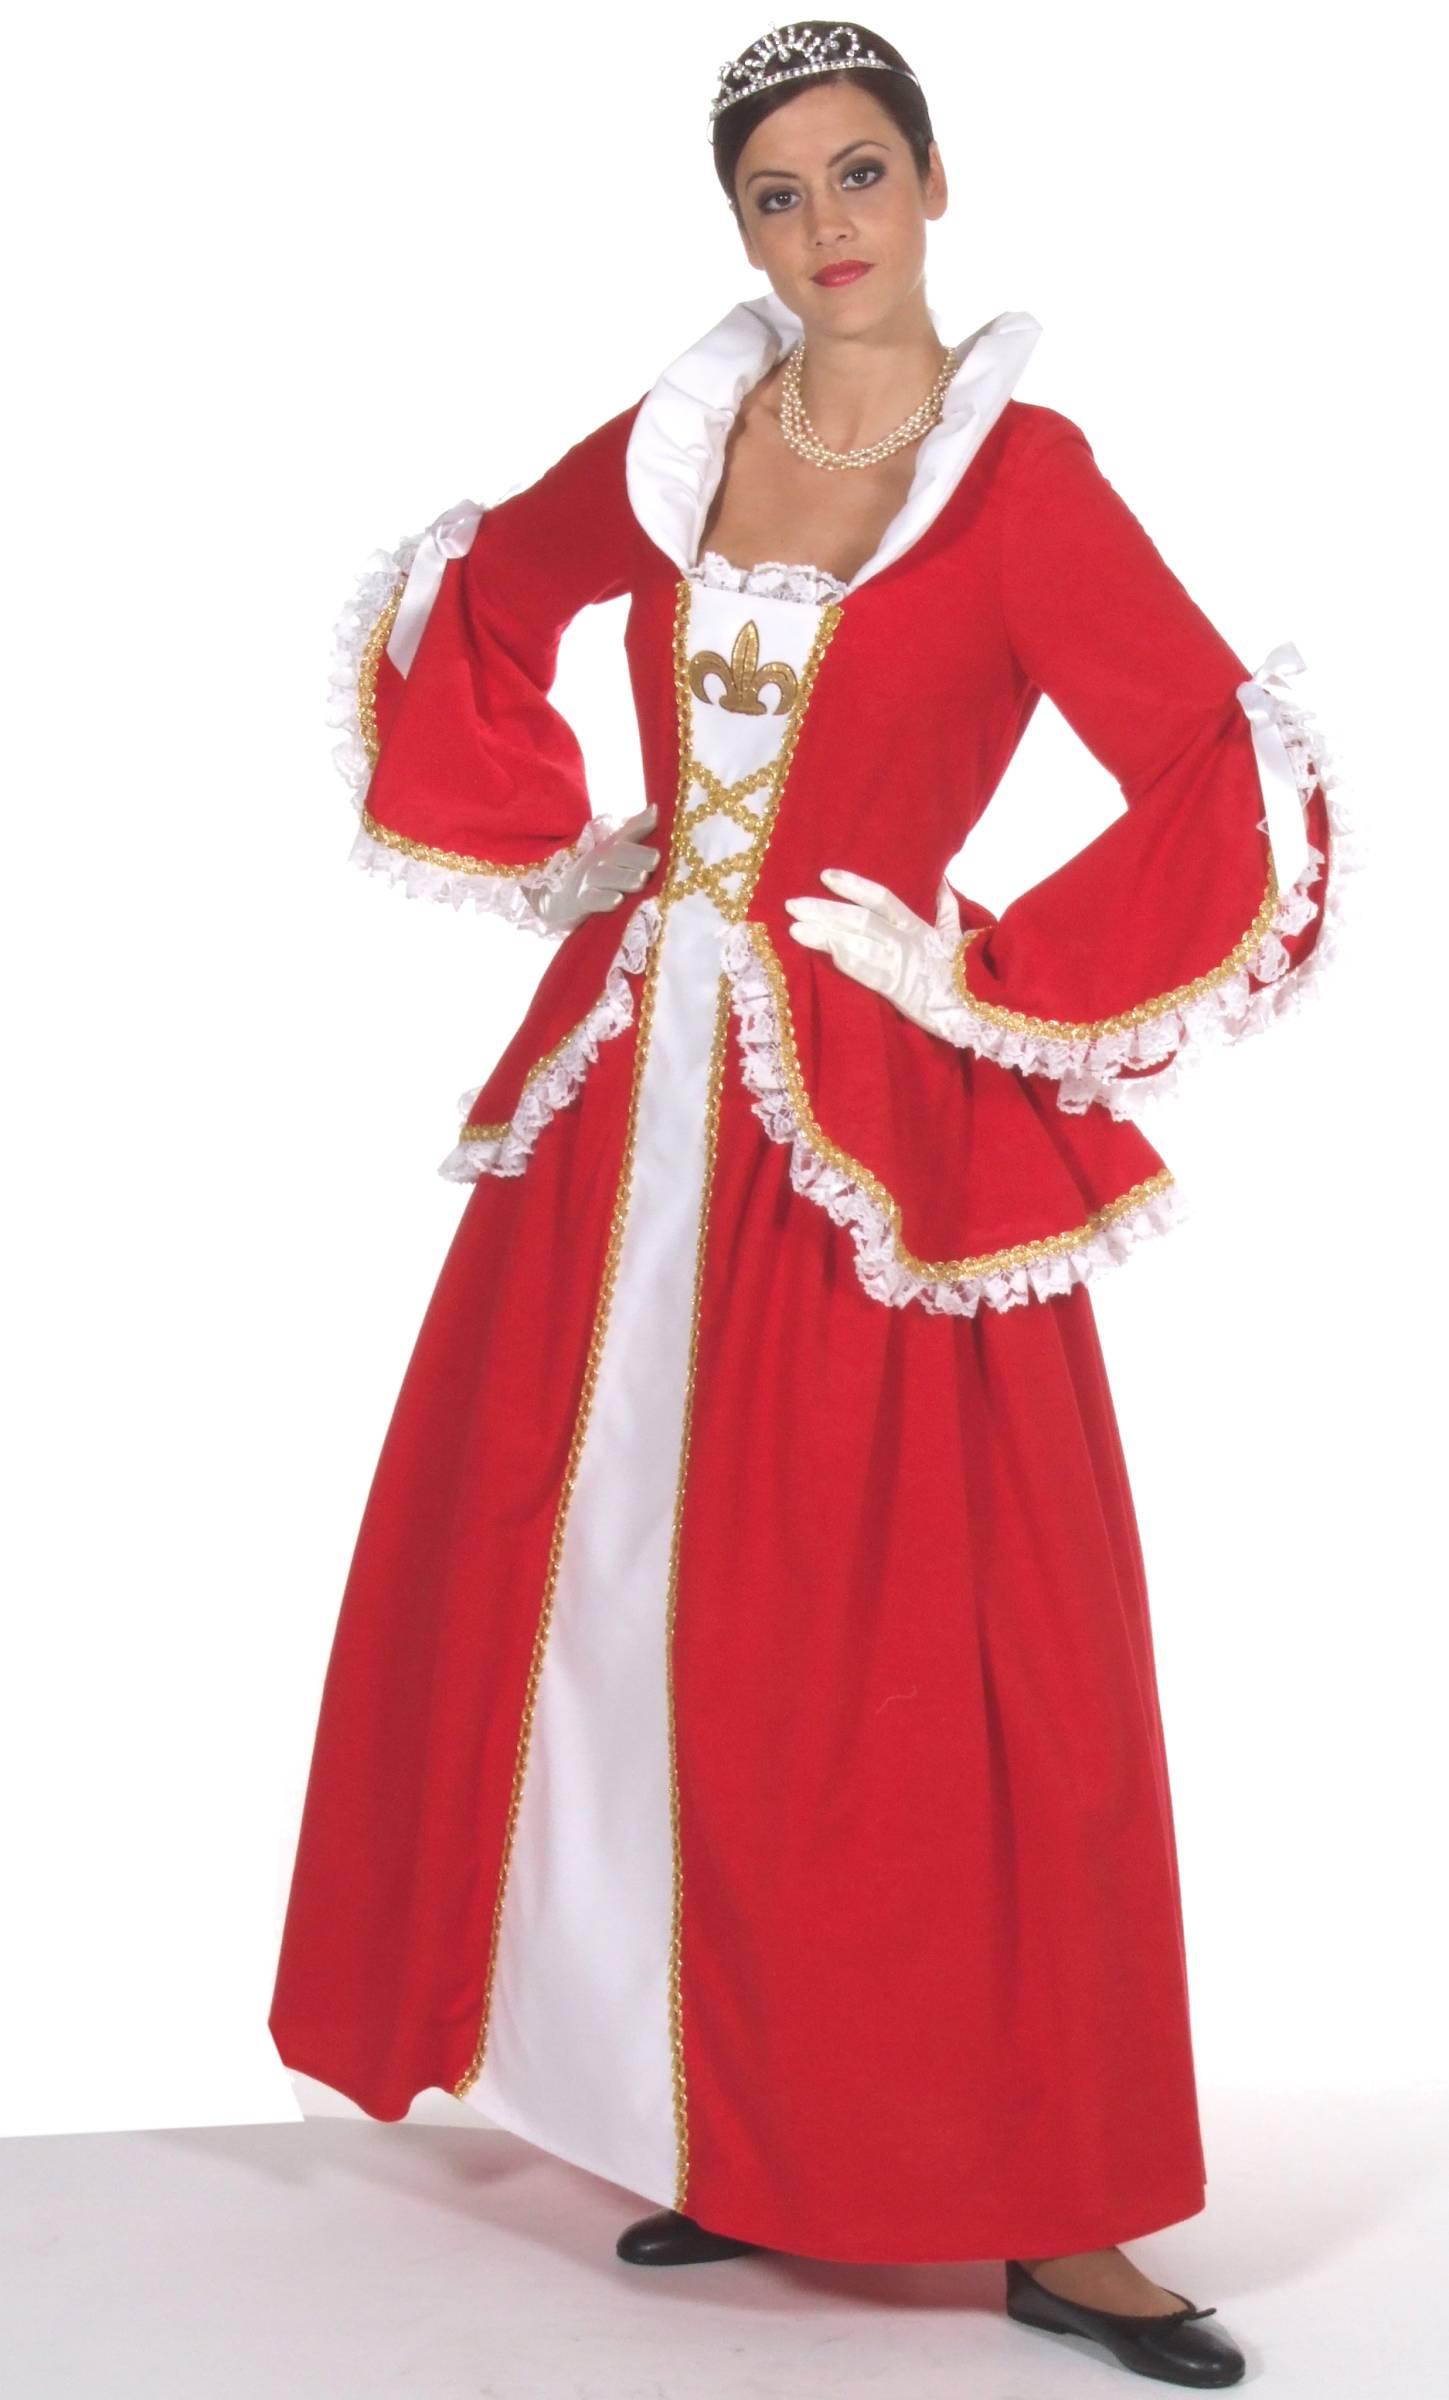 Costume-Robe-Marquise-Rubis